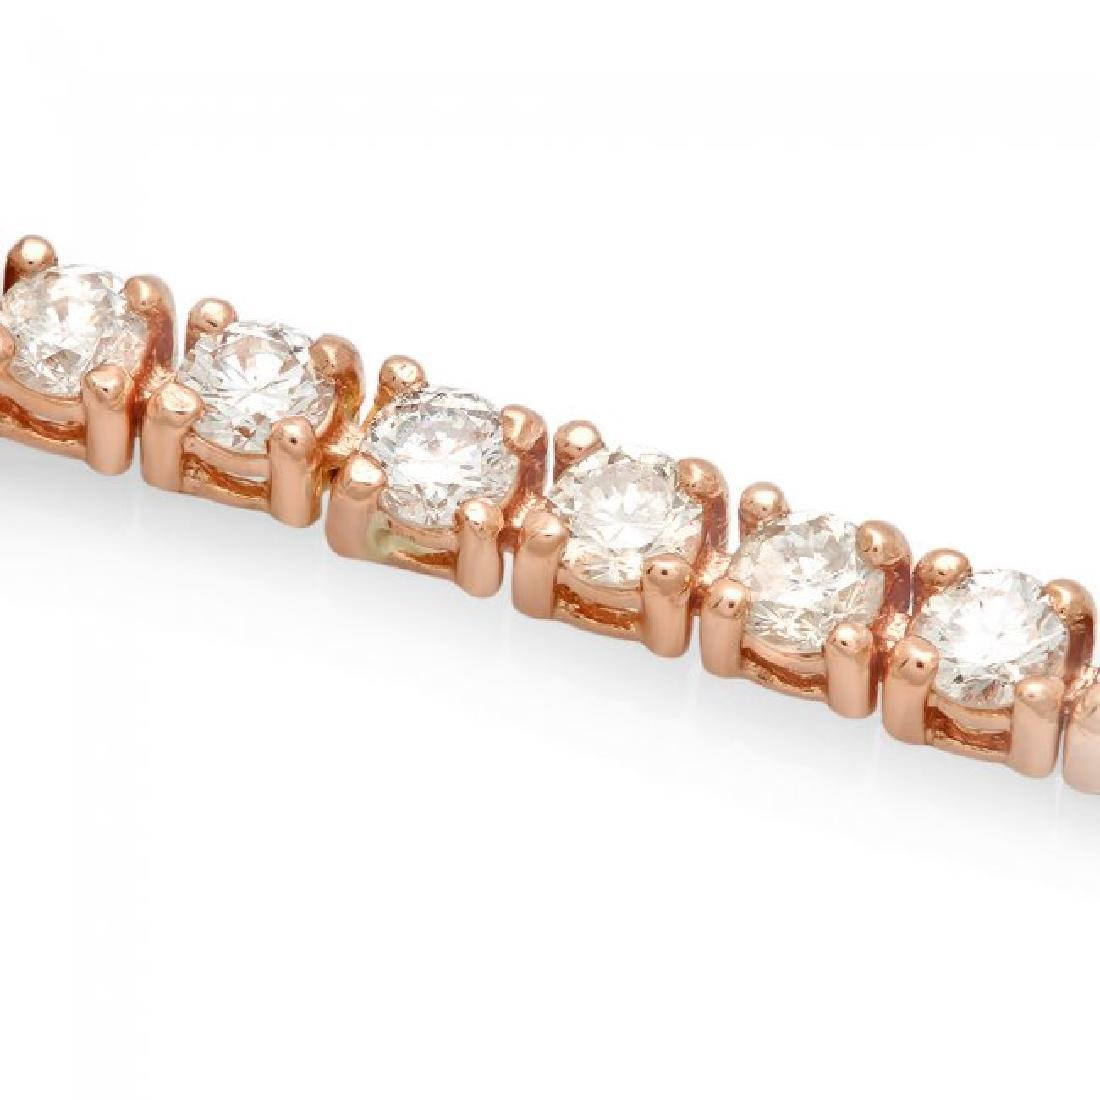 14k Rose Gold 3.60ct Diamond Bracelet - 3